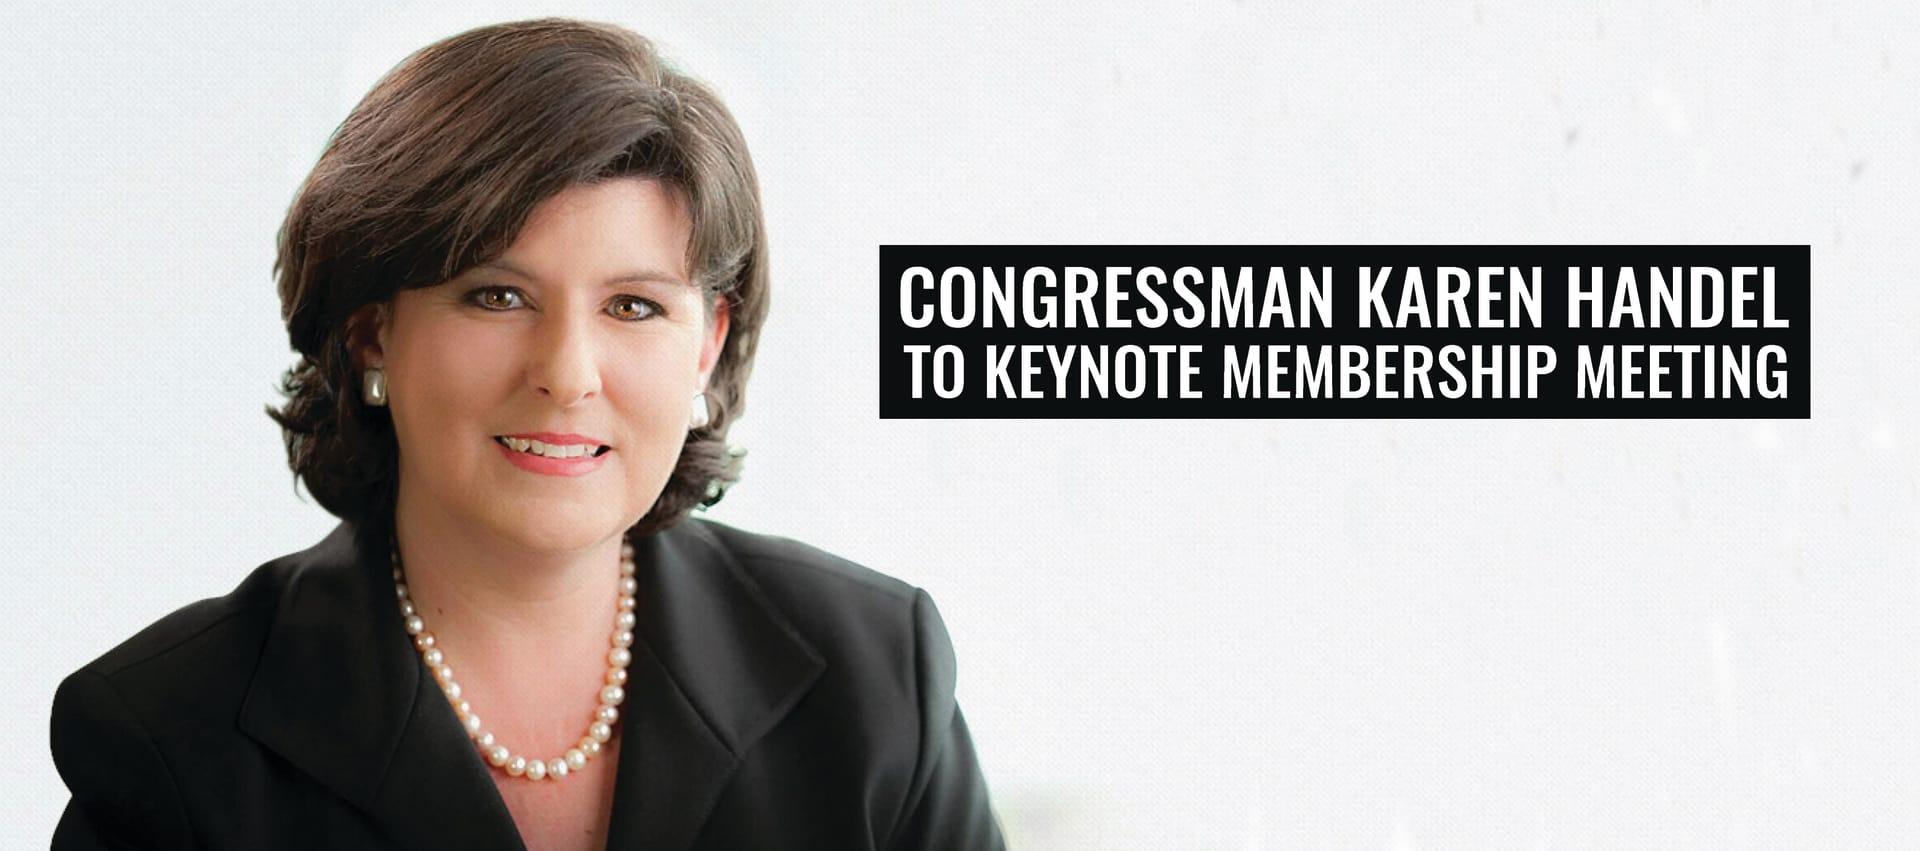 Congressman Karen Handel to Keynote Membership Meeting